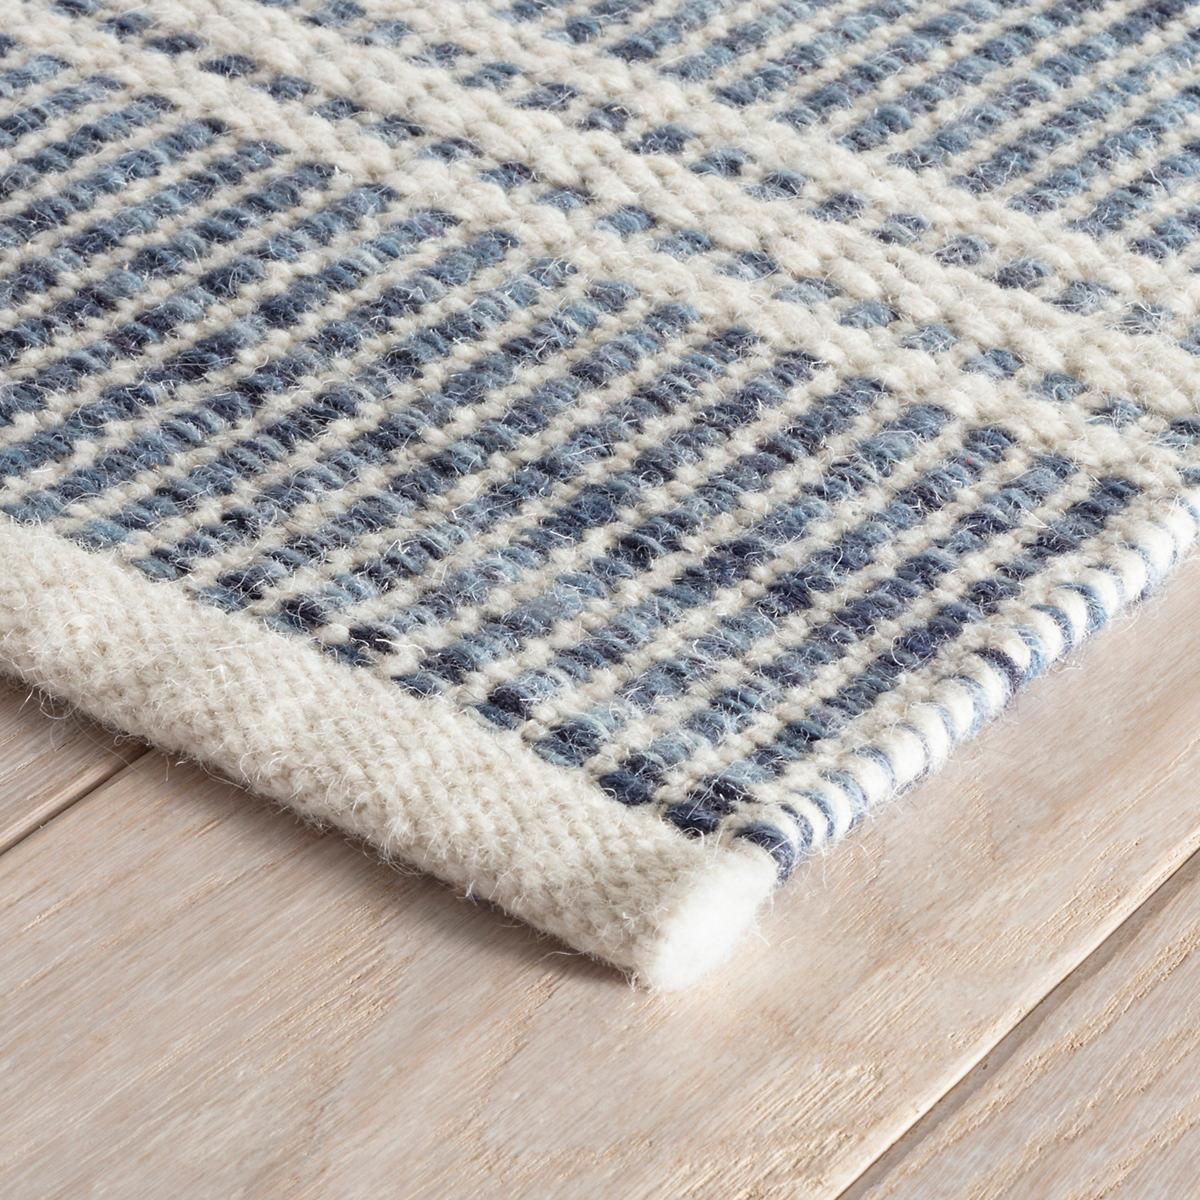 Malta Blue Woven Wool Rug Dash Albert